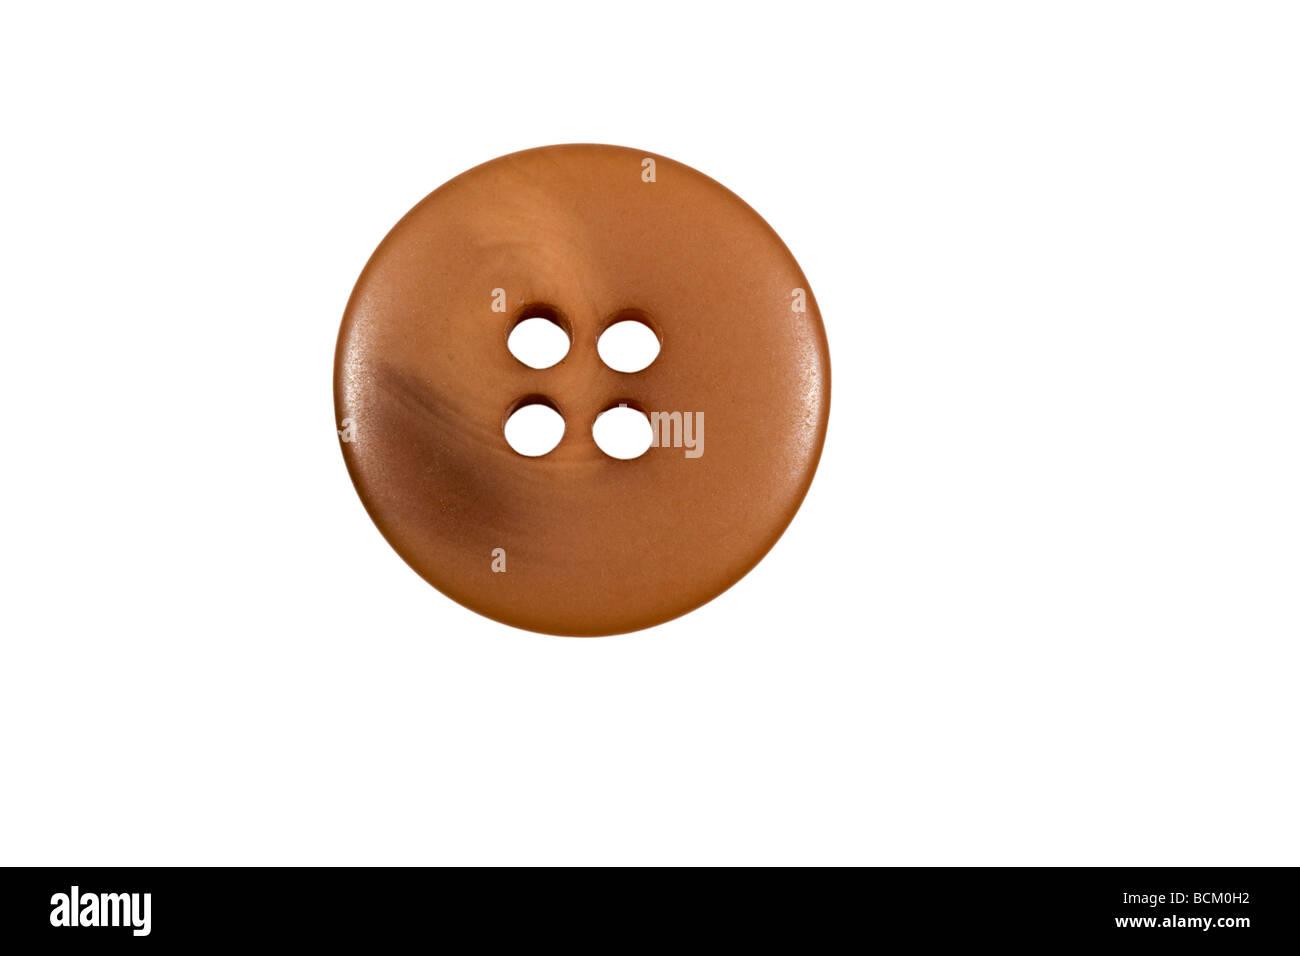 Reddish brown coloured button - Stock Image